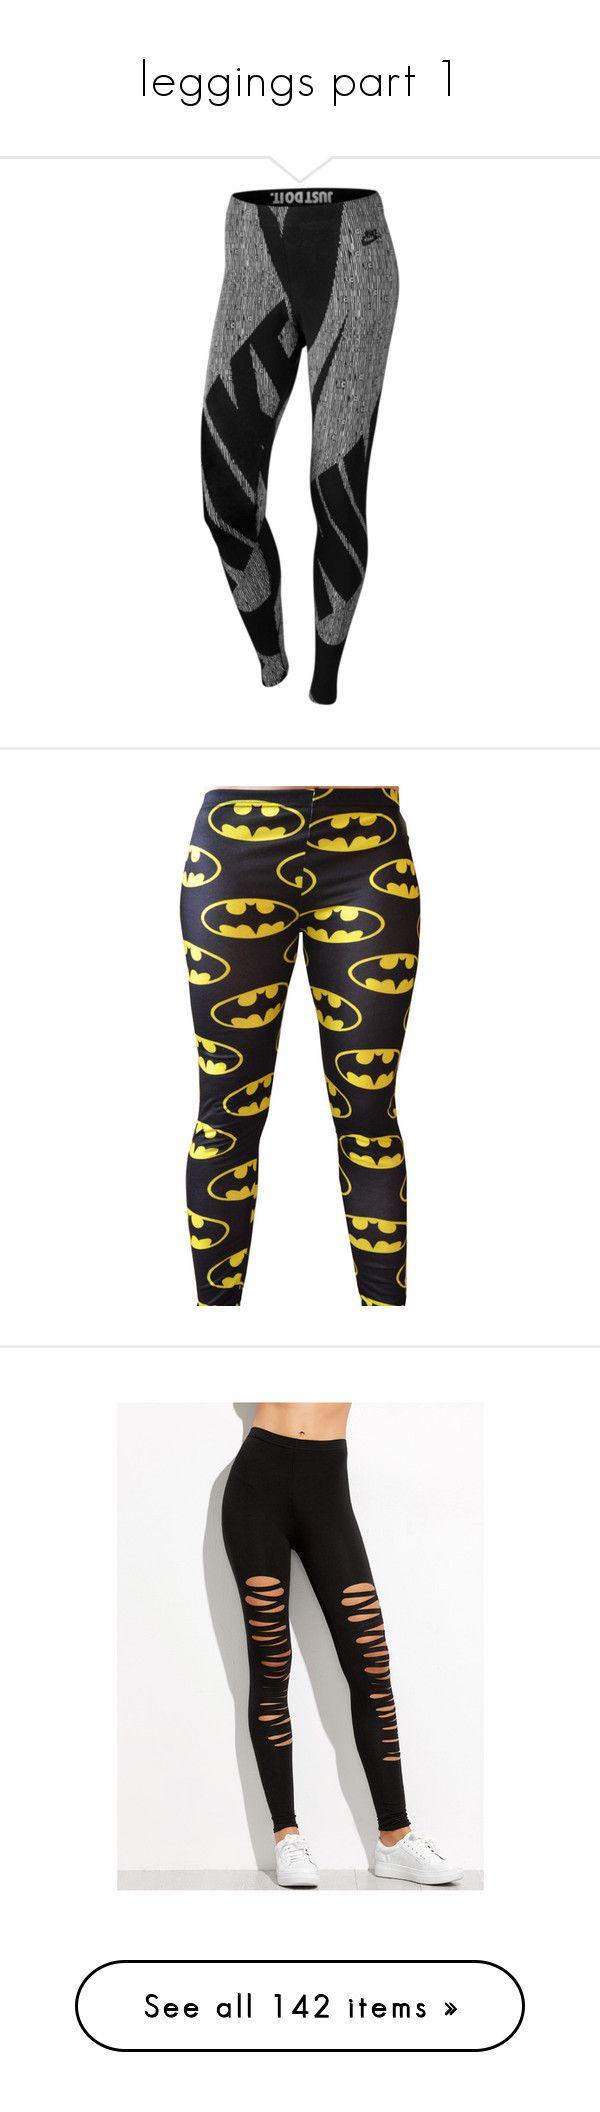 """leggings part 1"" by zoe-sears on Polyvore featuring pants, leggings, bottoms, sport, black, sports trousers, sports leggings, nike leggings, nike and legging pants"